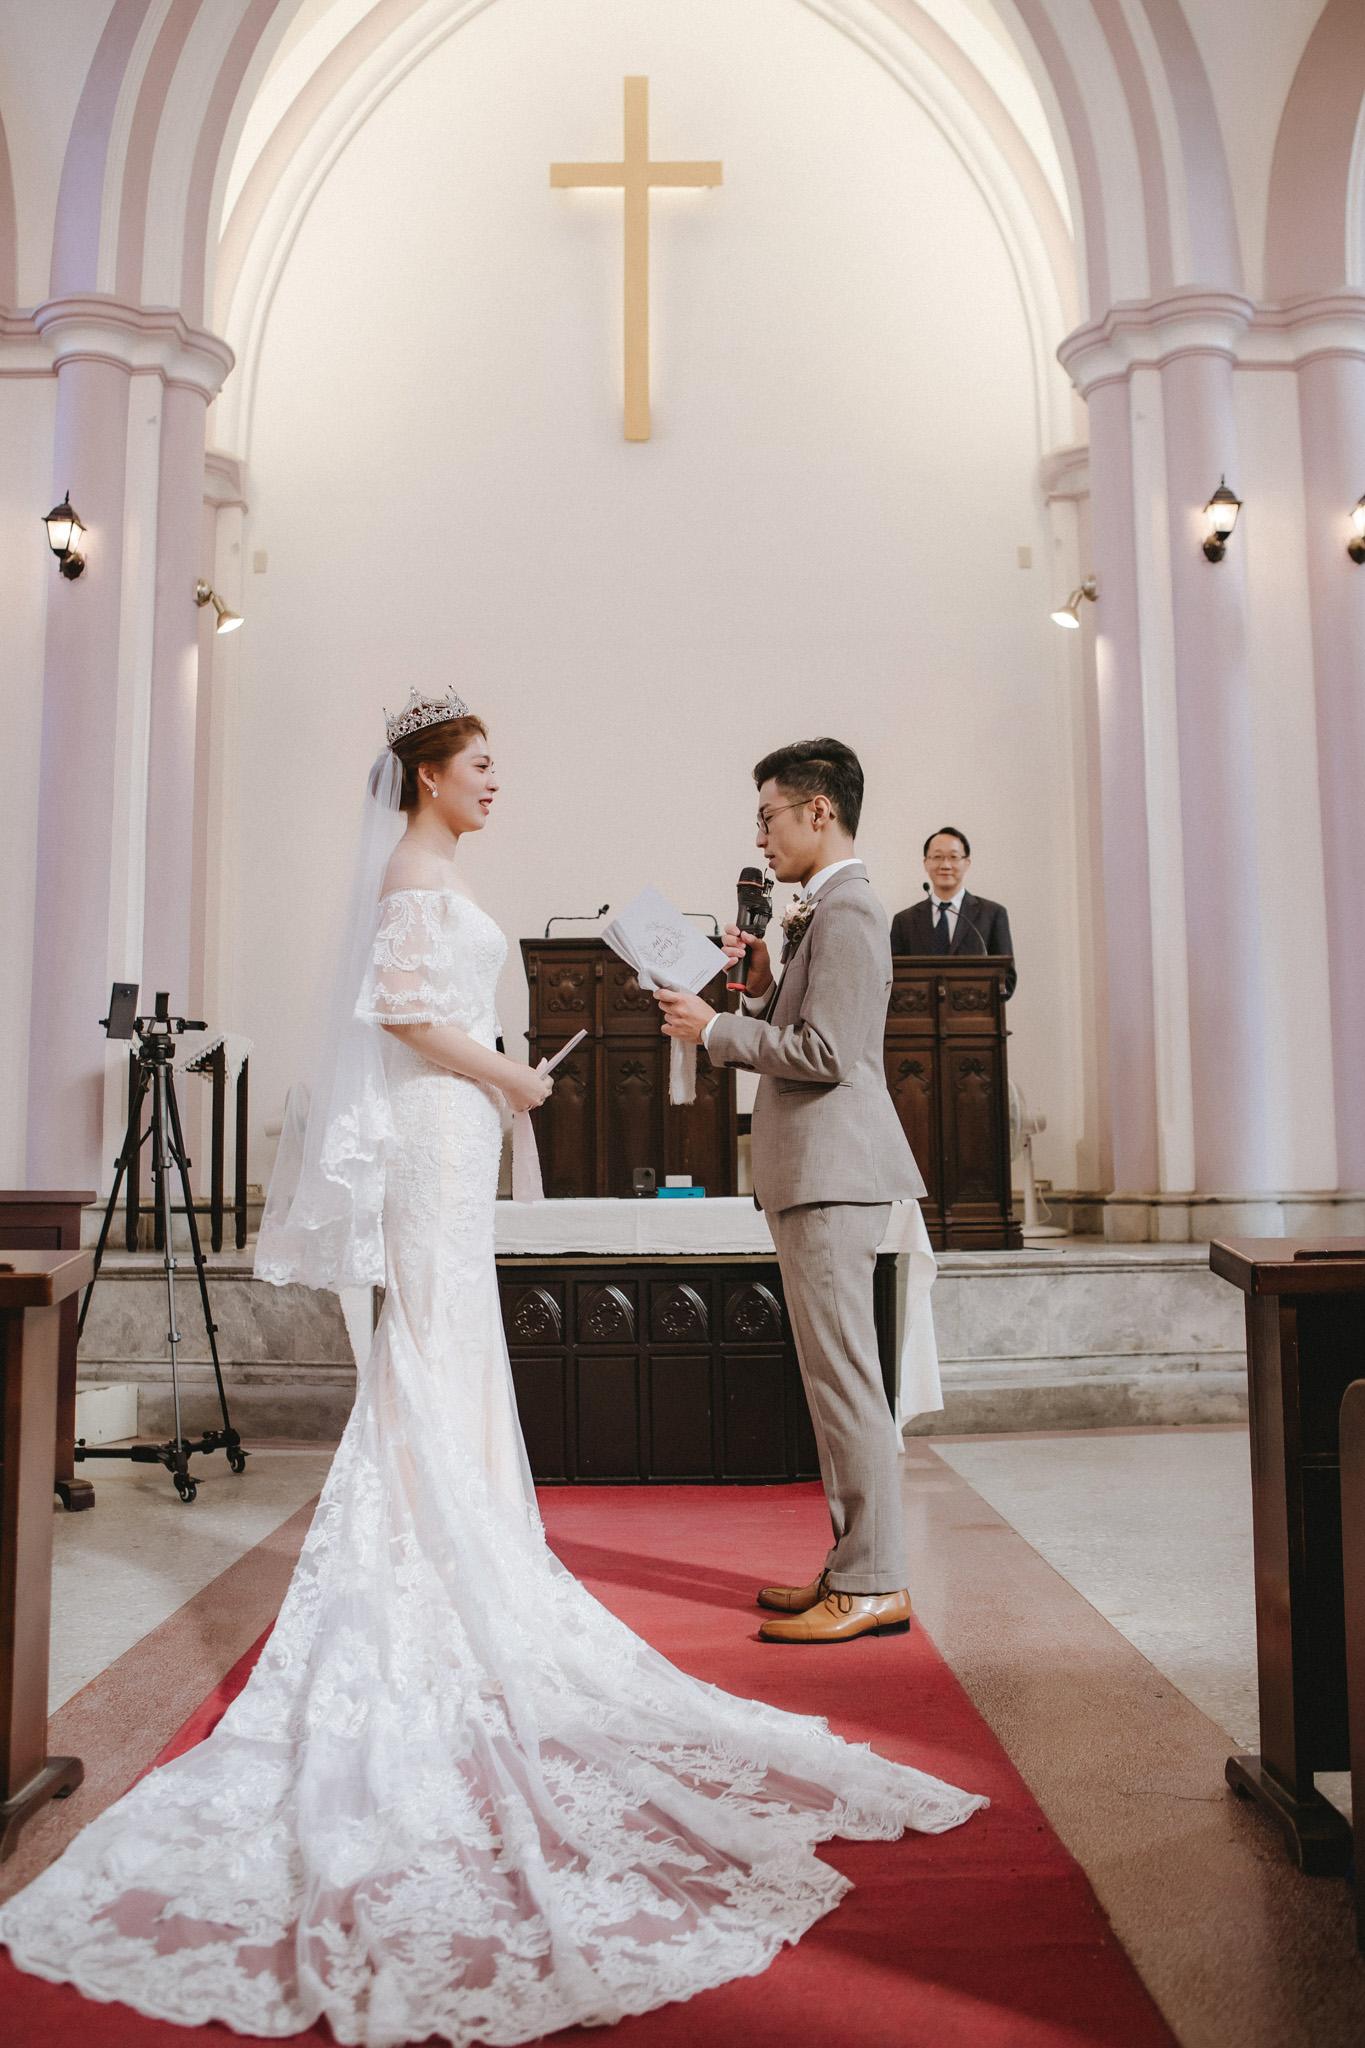 EW 台北婚攝 居米 濟南教會 Brick Yard 33 美軍俱樂部 婚禮 婚宴-36